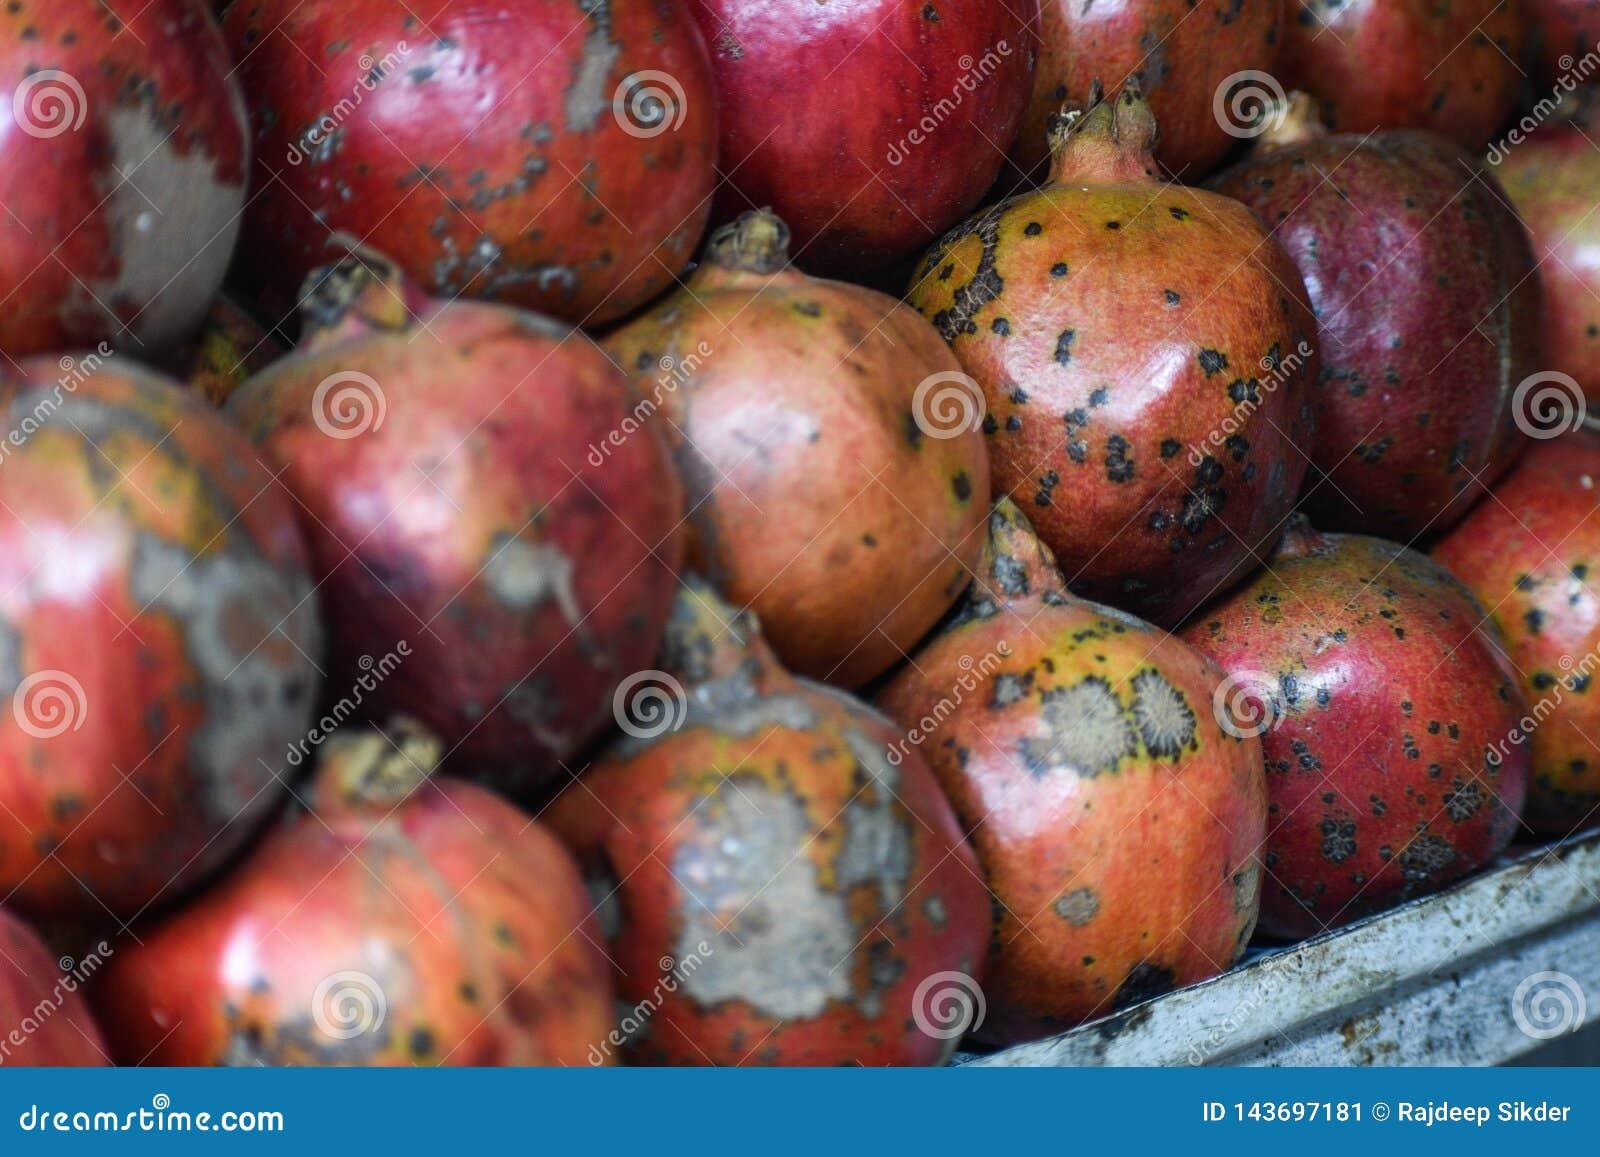 Ein Stapel rote Granatäpfel